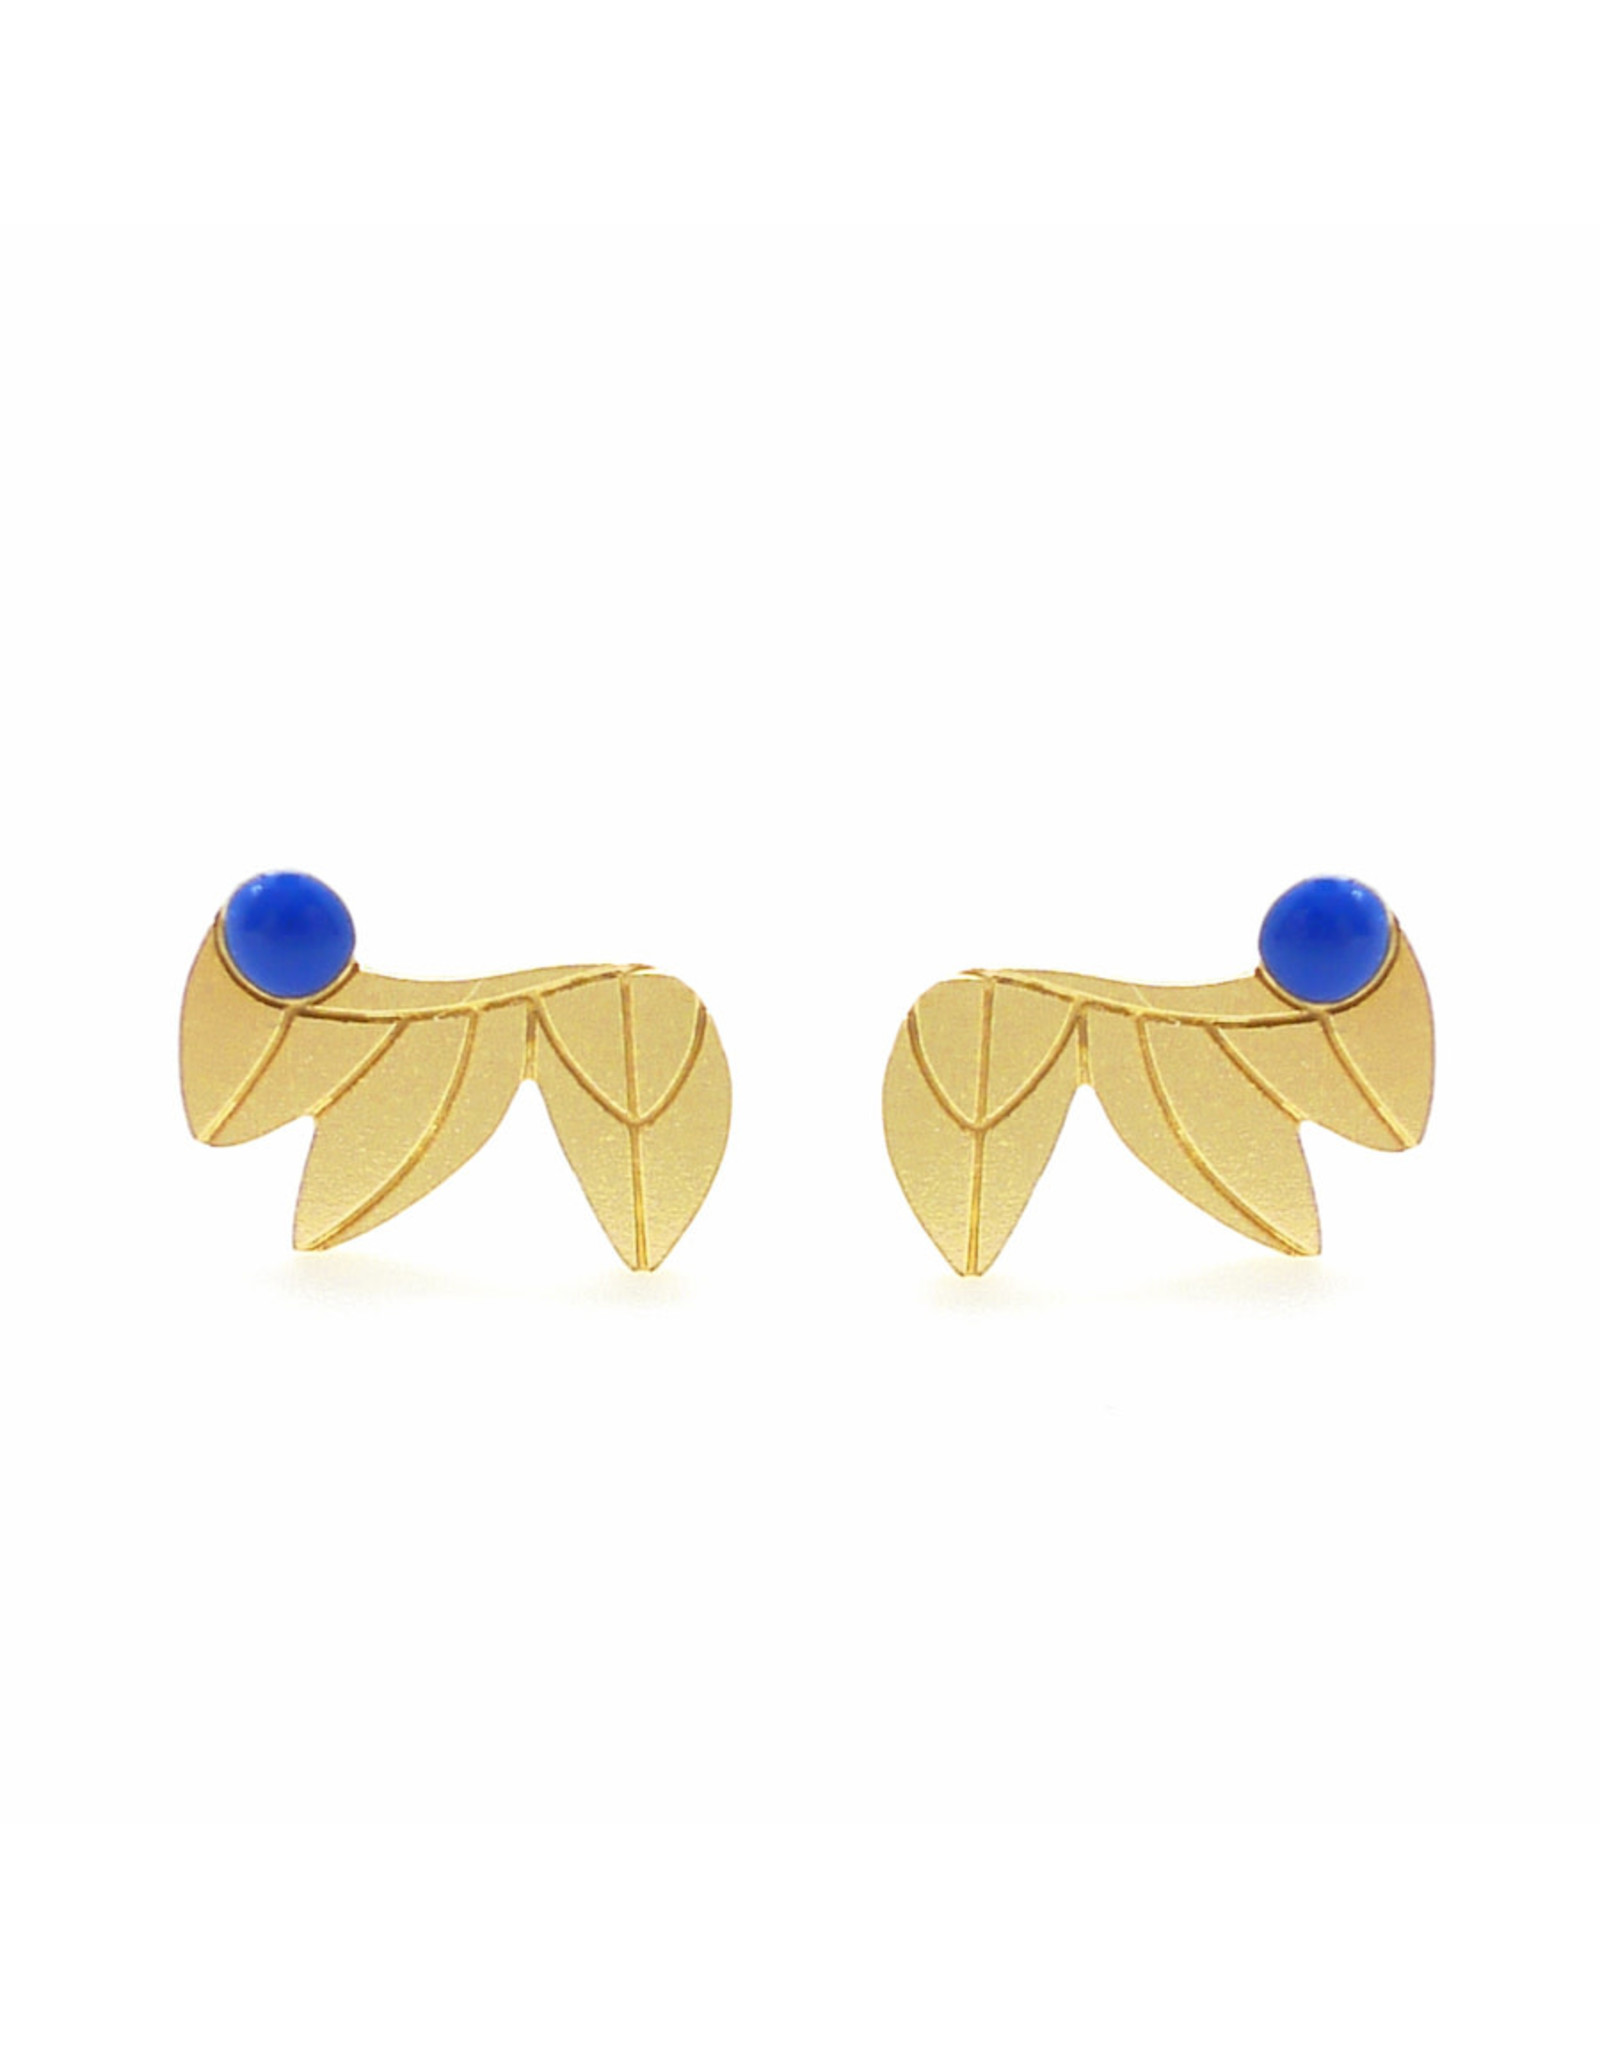 Nadja Carlotti Studs Feathers, gold plated Prusian Blue